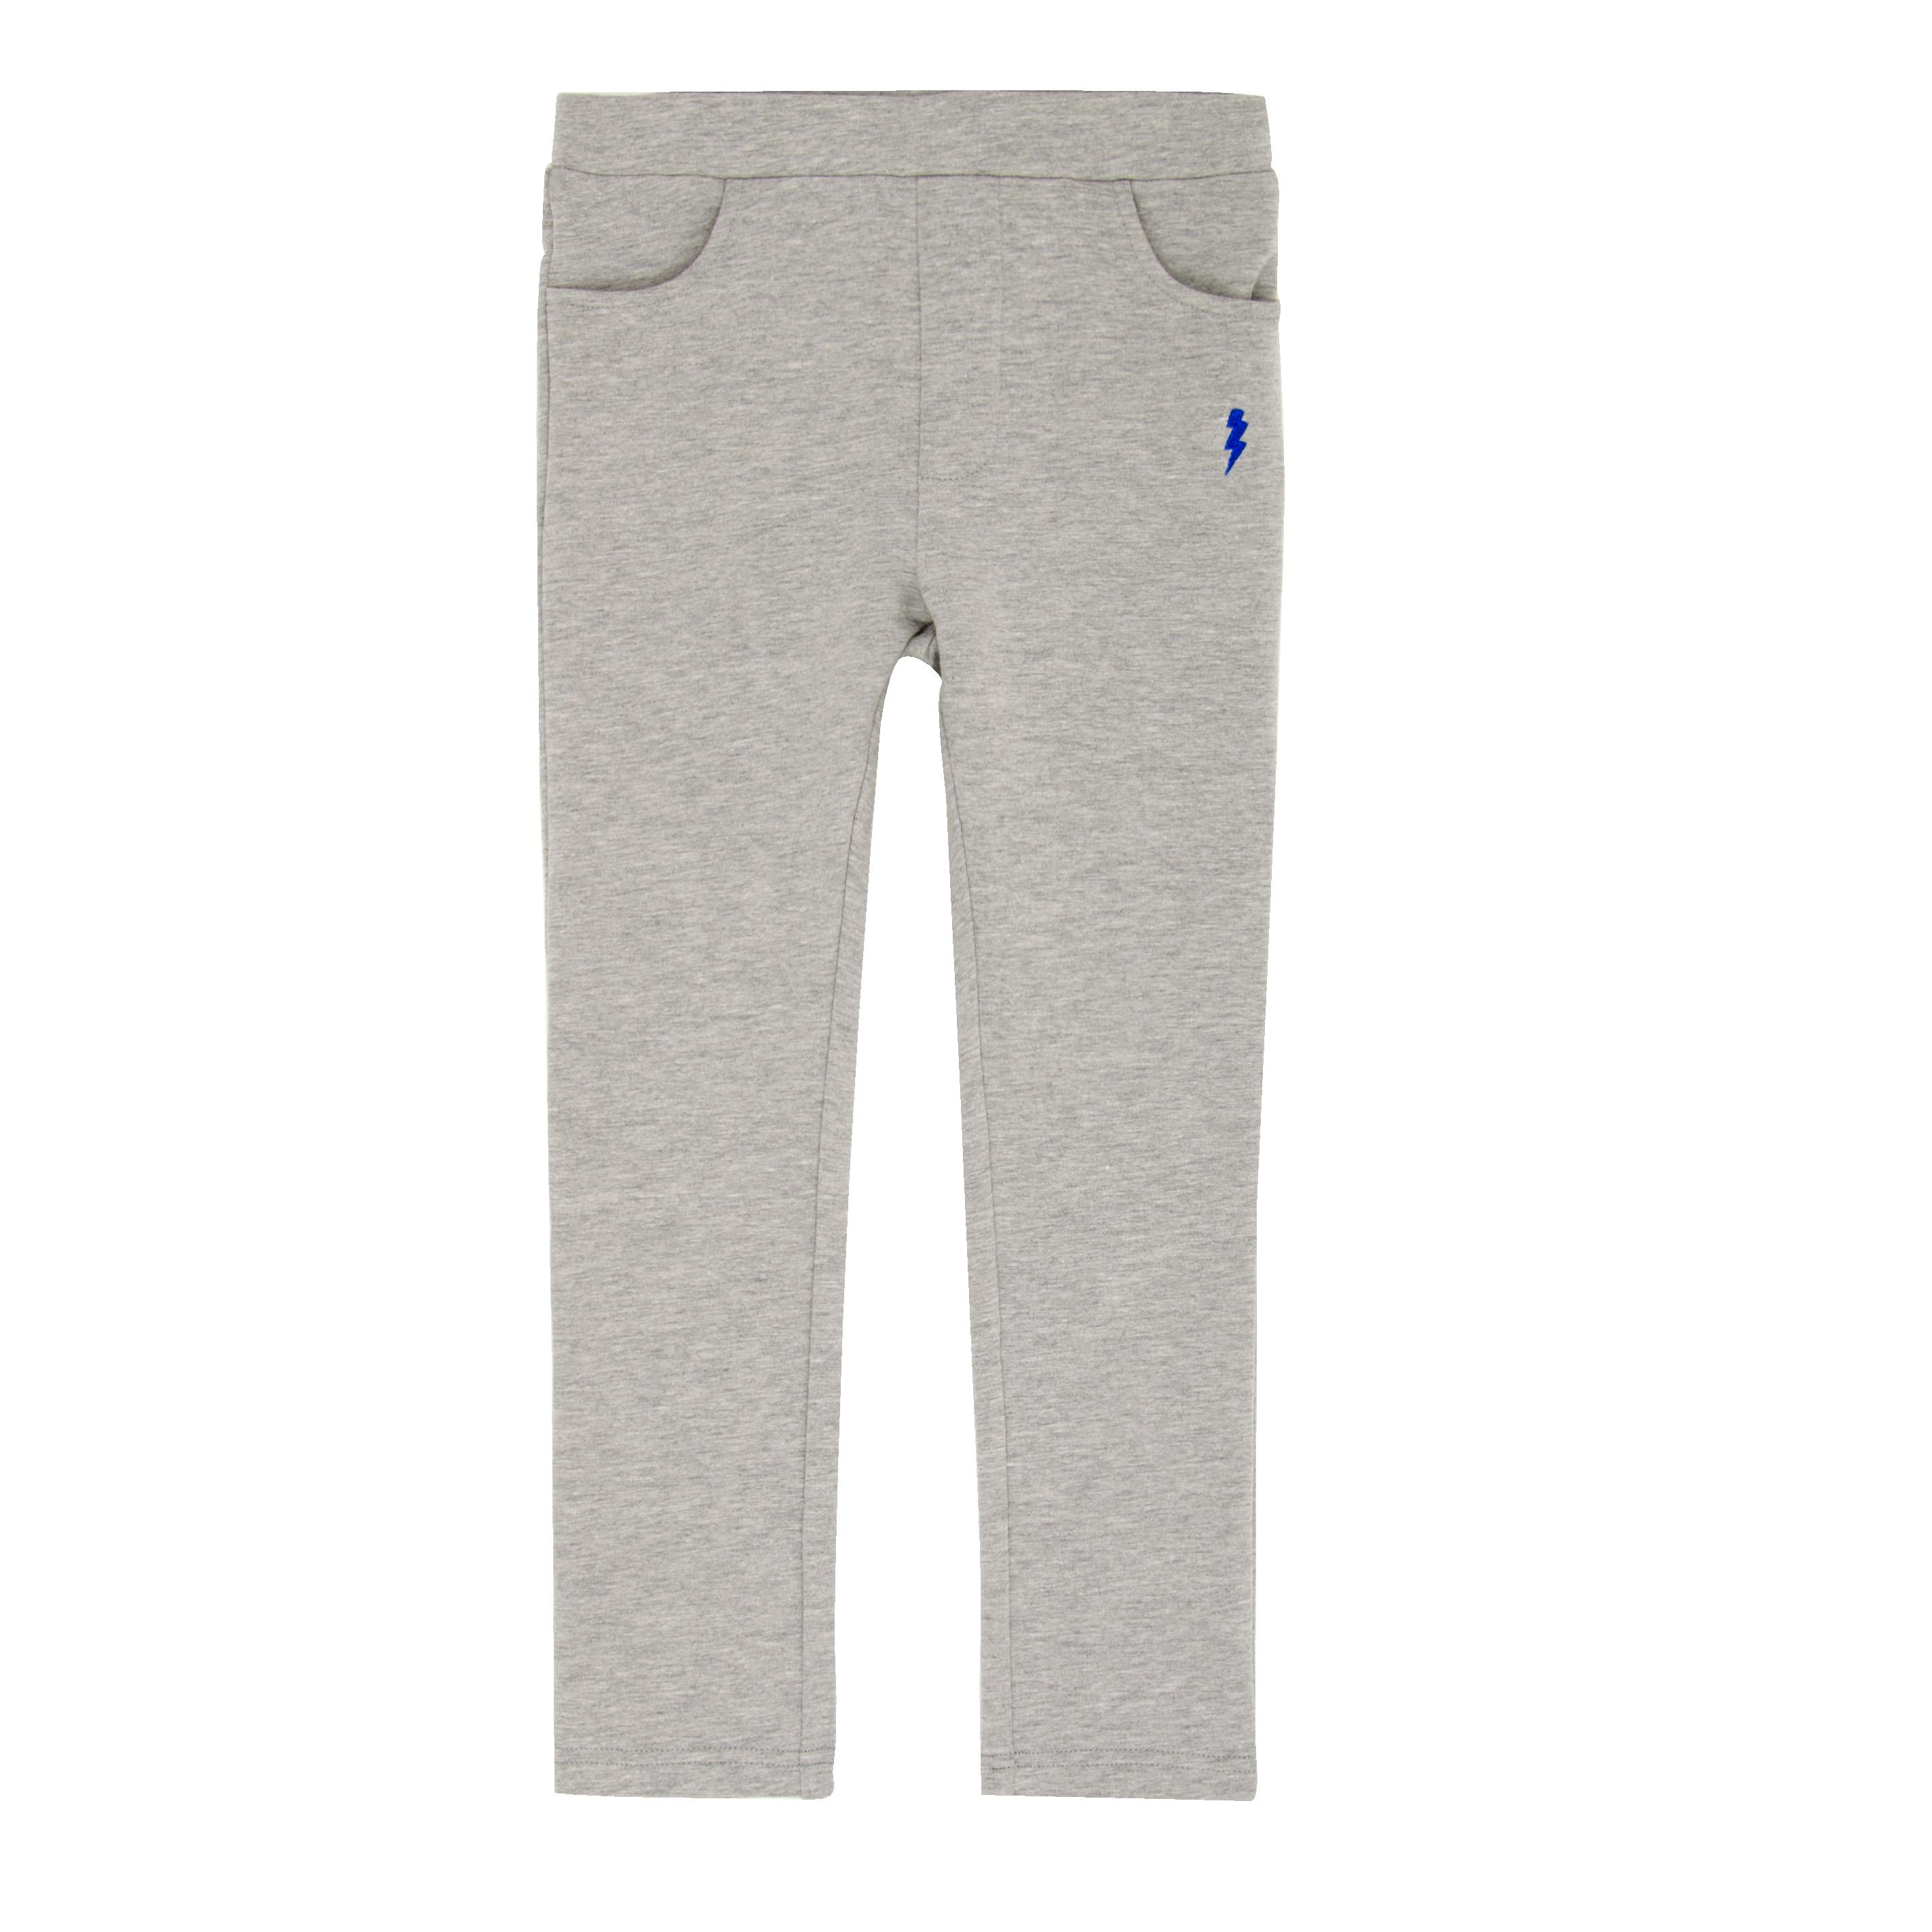 5c0be13dc85 Jeans leggings bolt – Grå - Gardner and the gang - Ekobay Store för en  hållbar